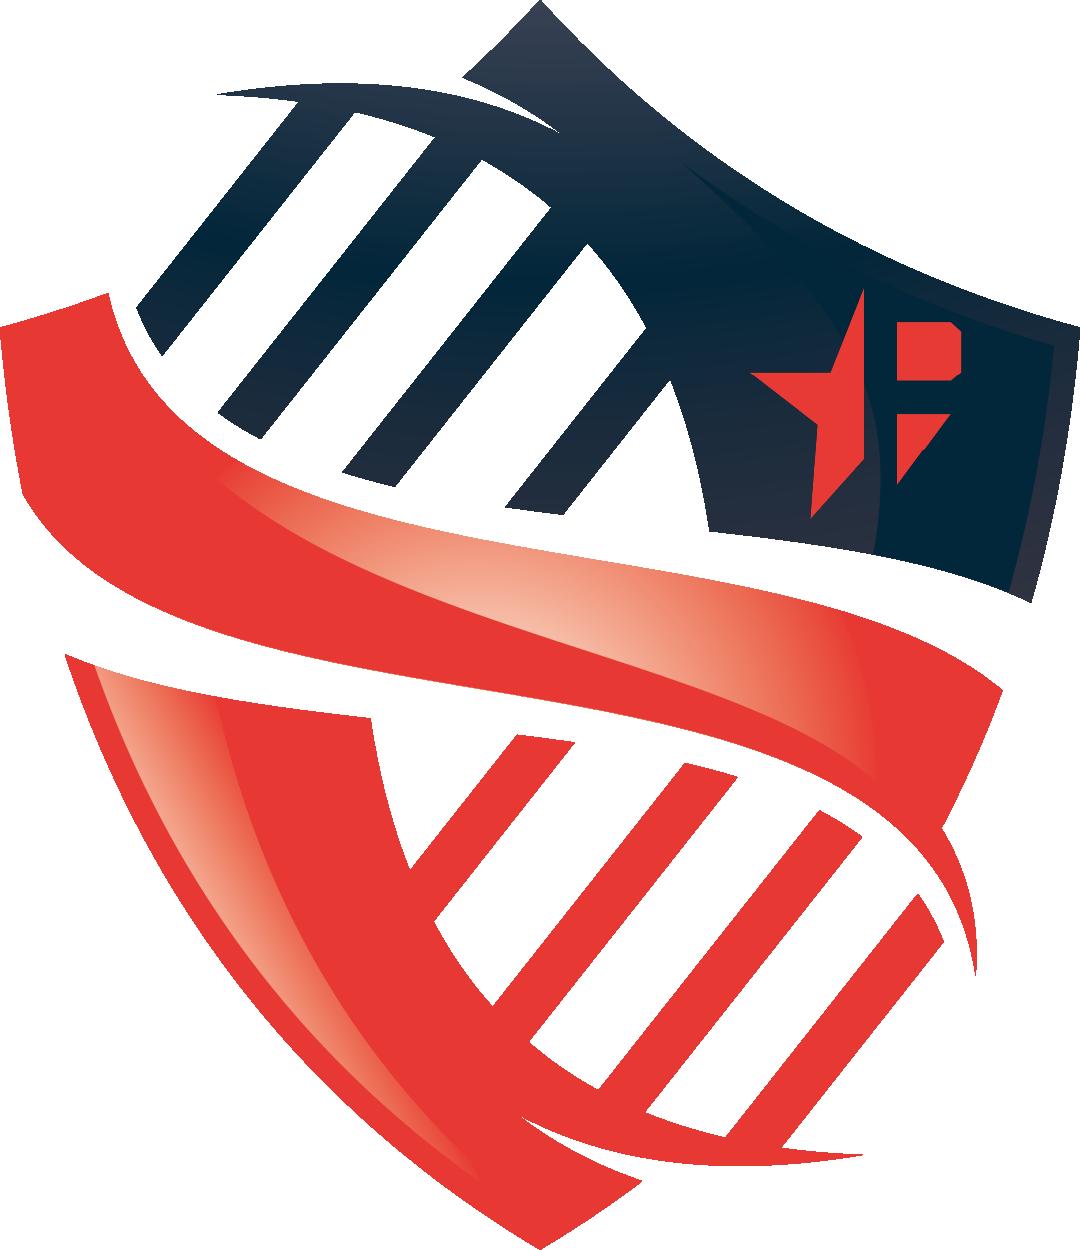 Athlete SAT - Knoxville logo